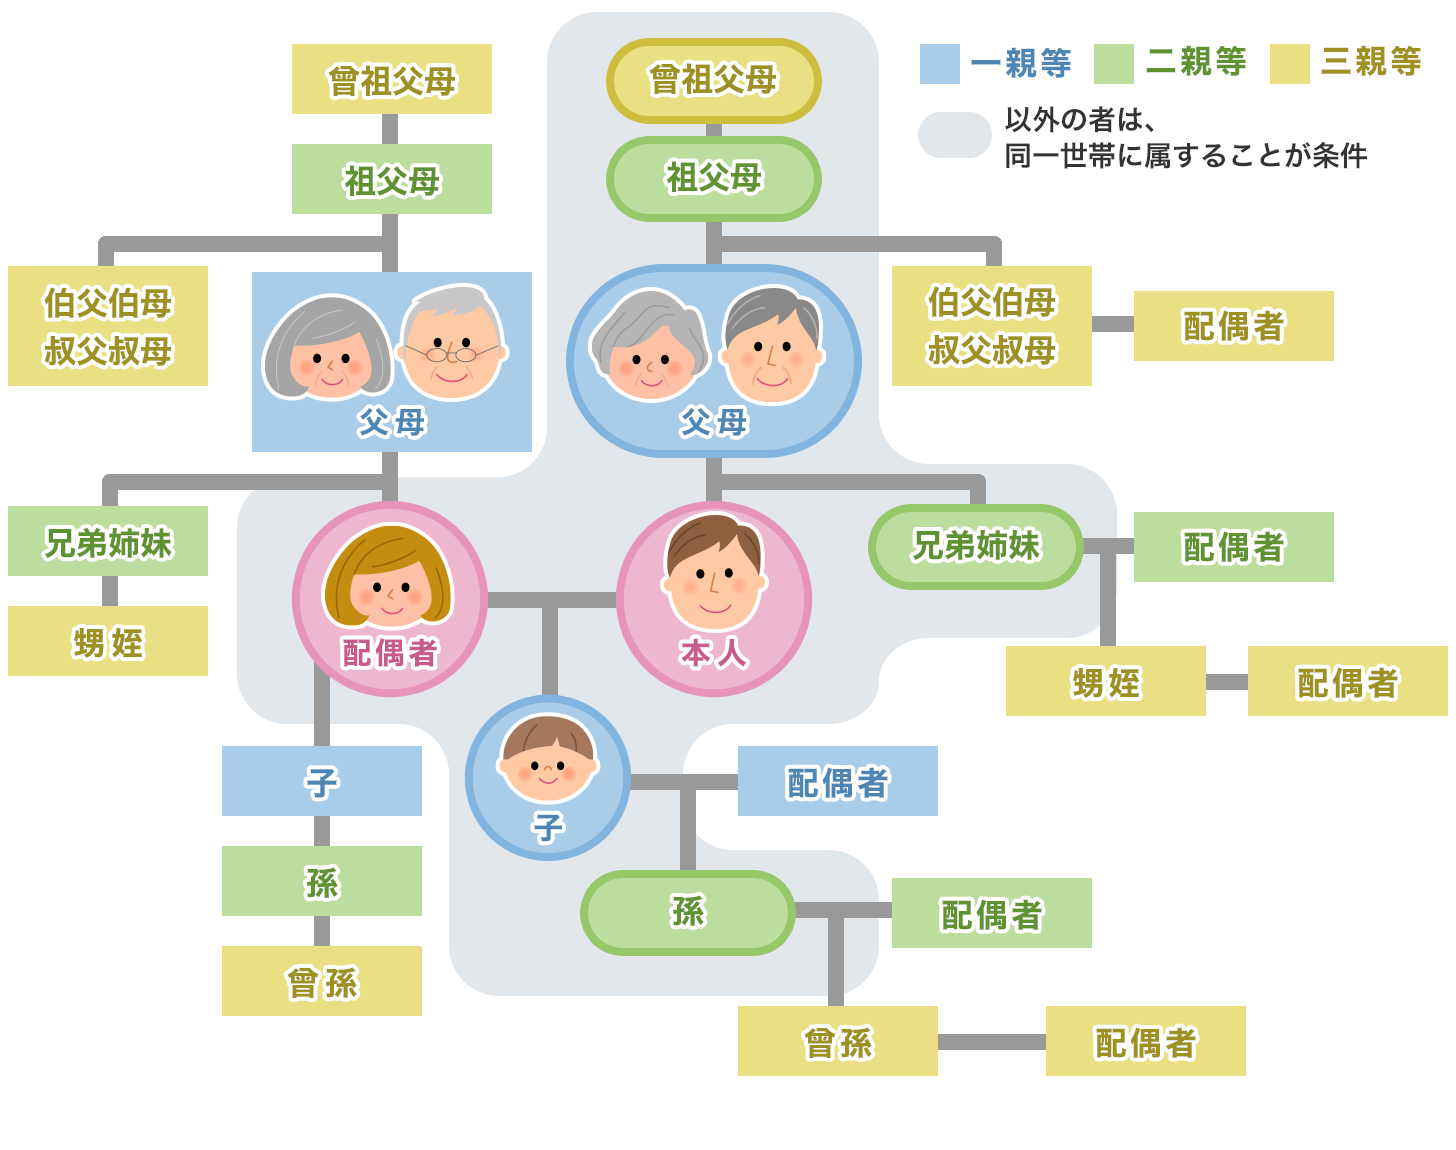 被扶養者の範囲図(三親等の親族図)